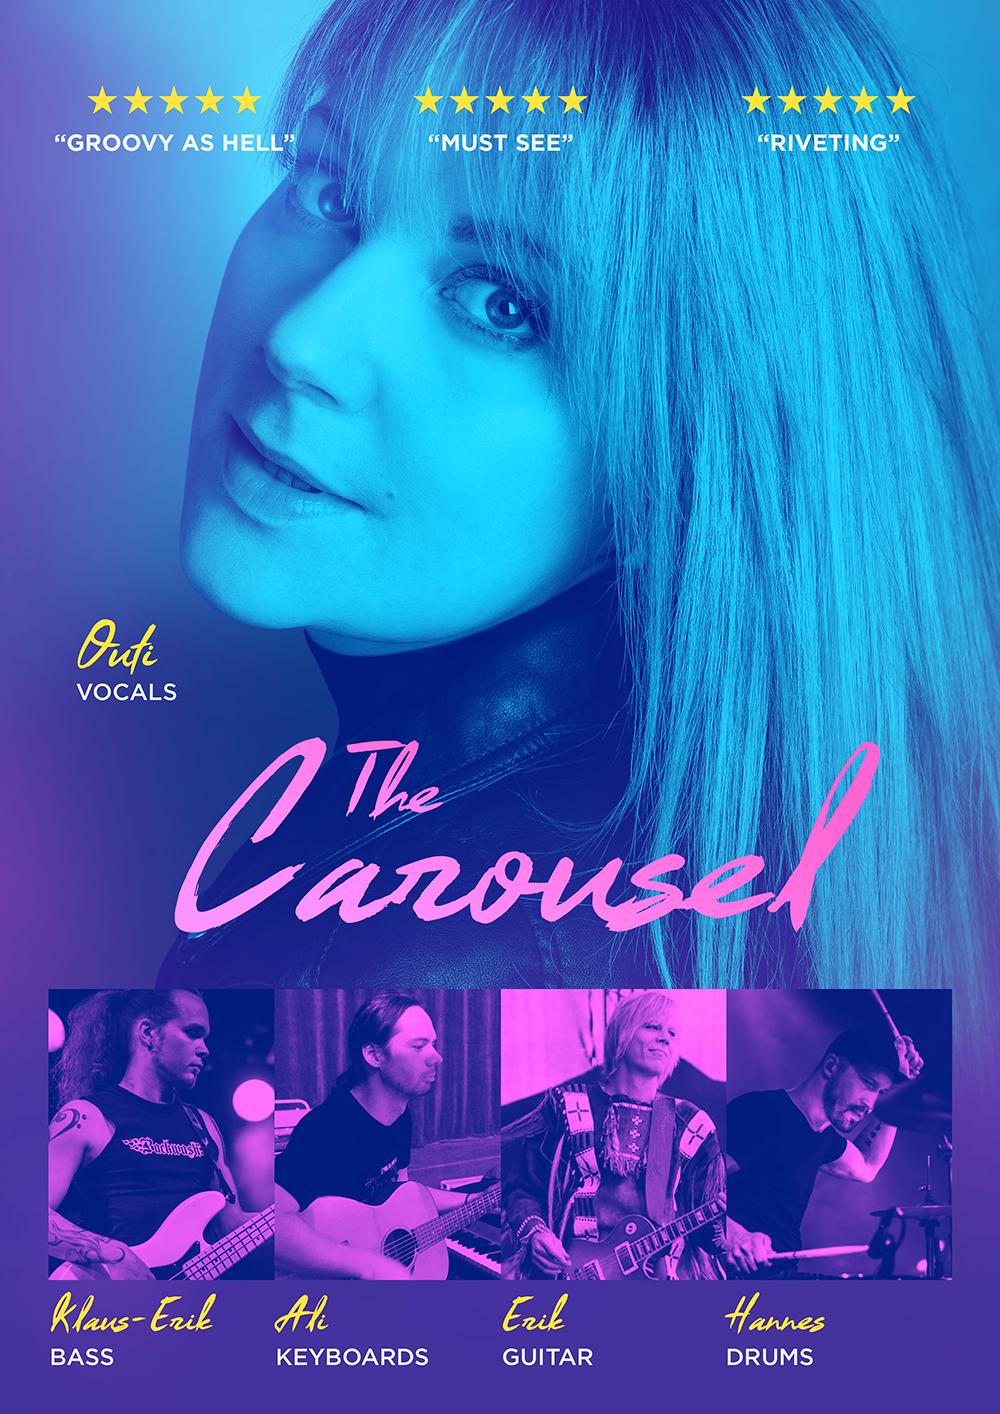 the_carousel_juliste_a3_300dpi_2018.jpg